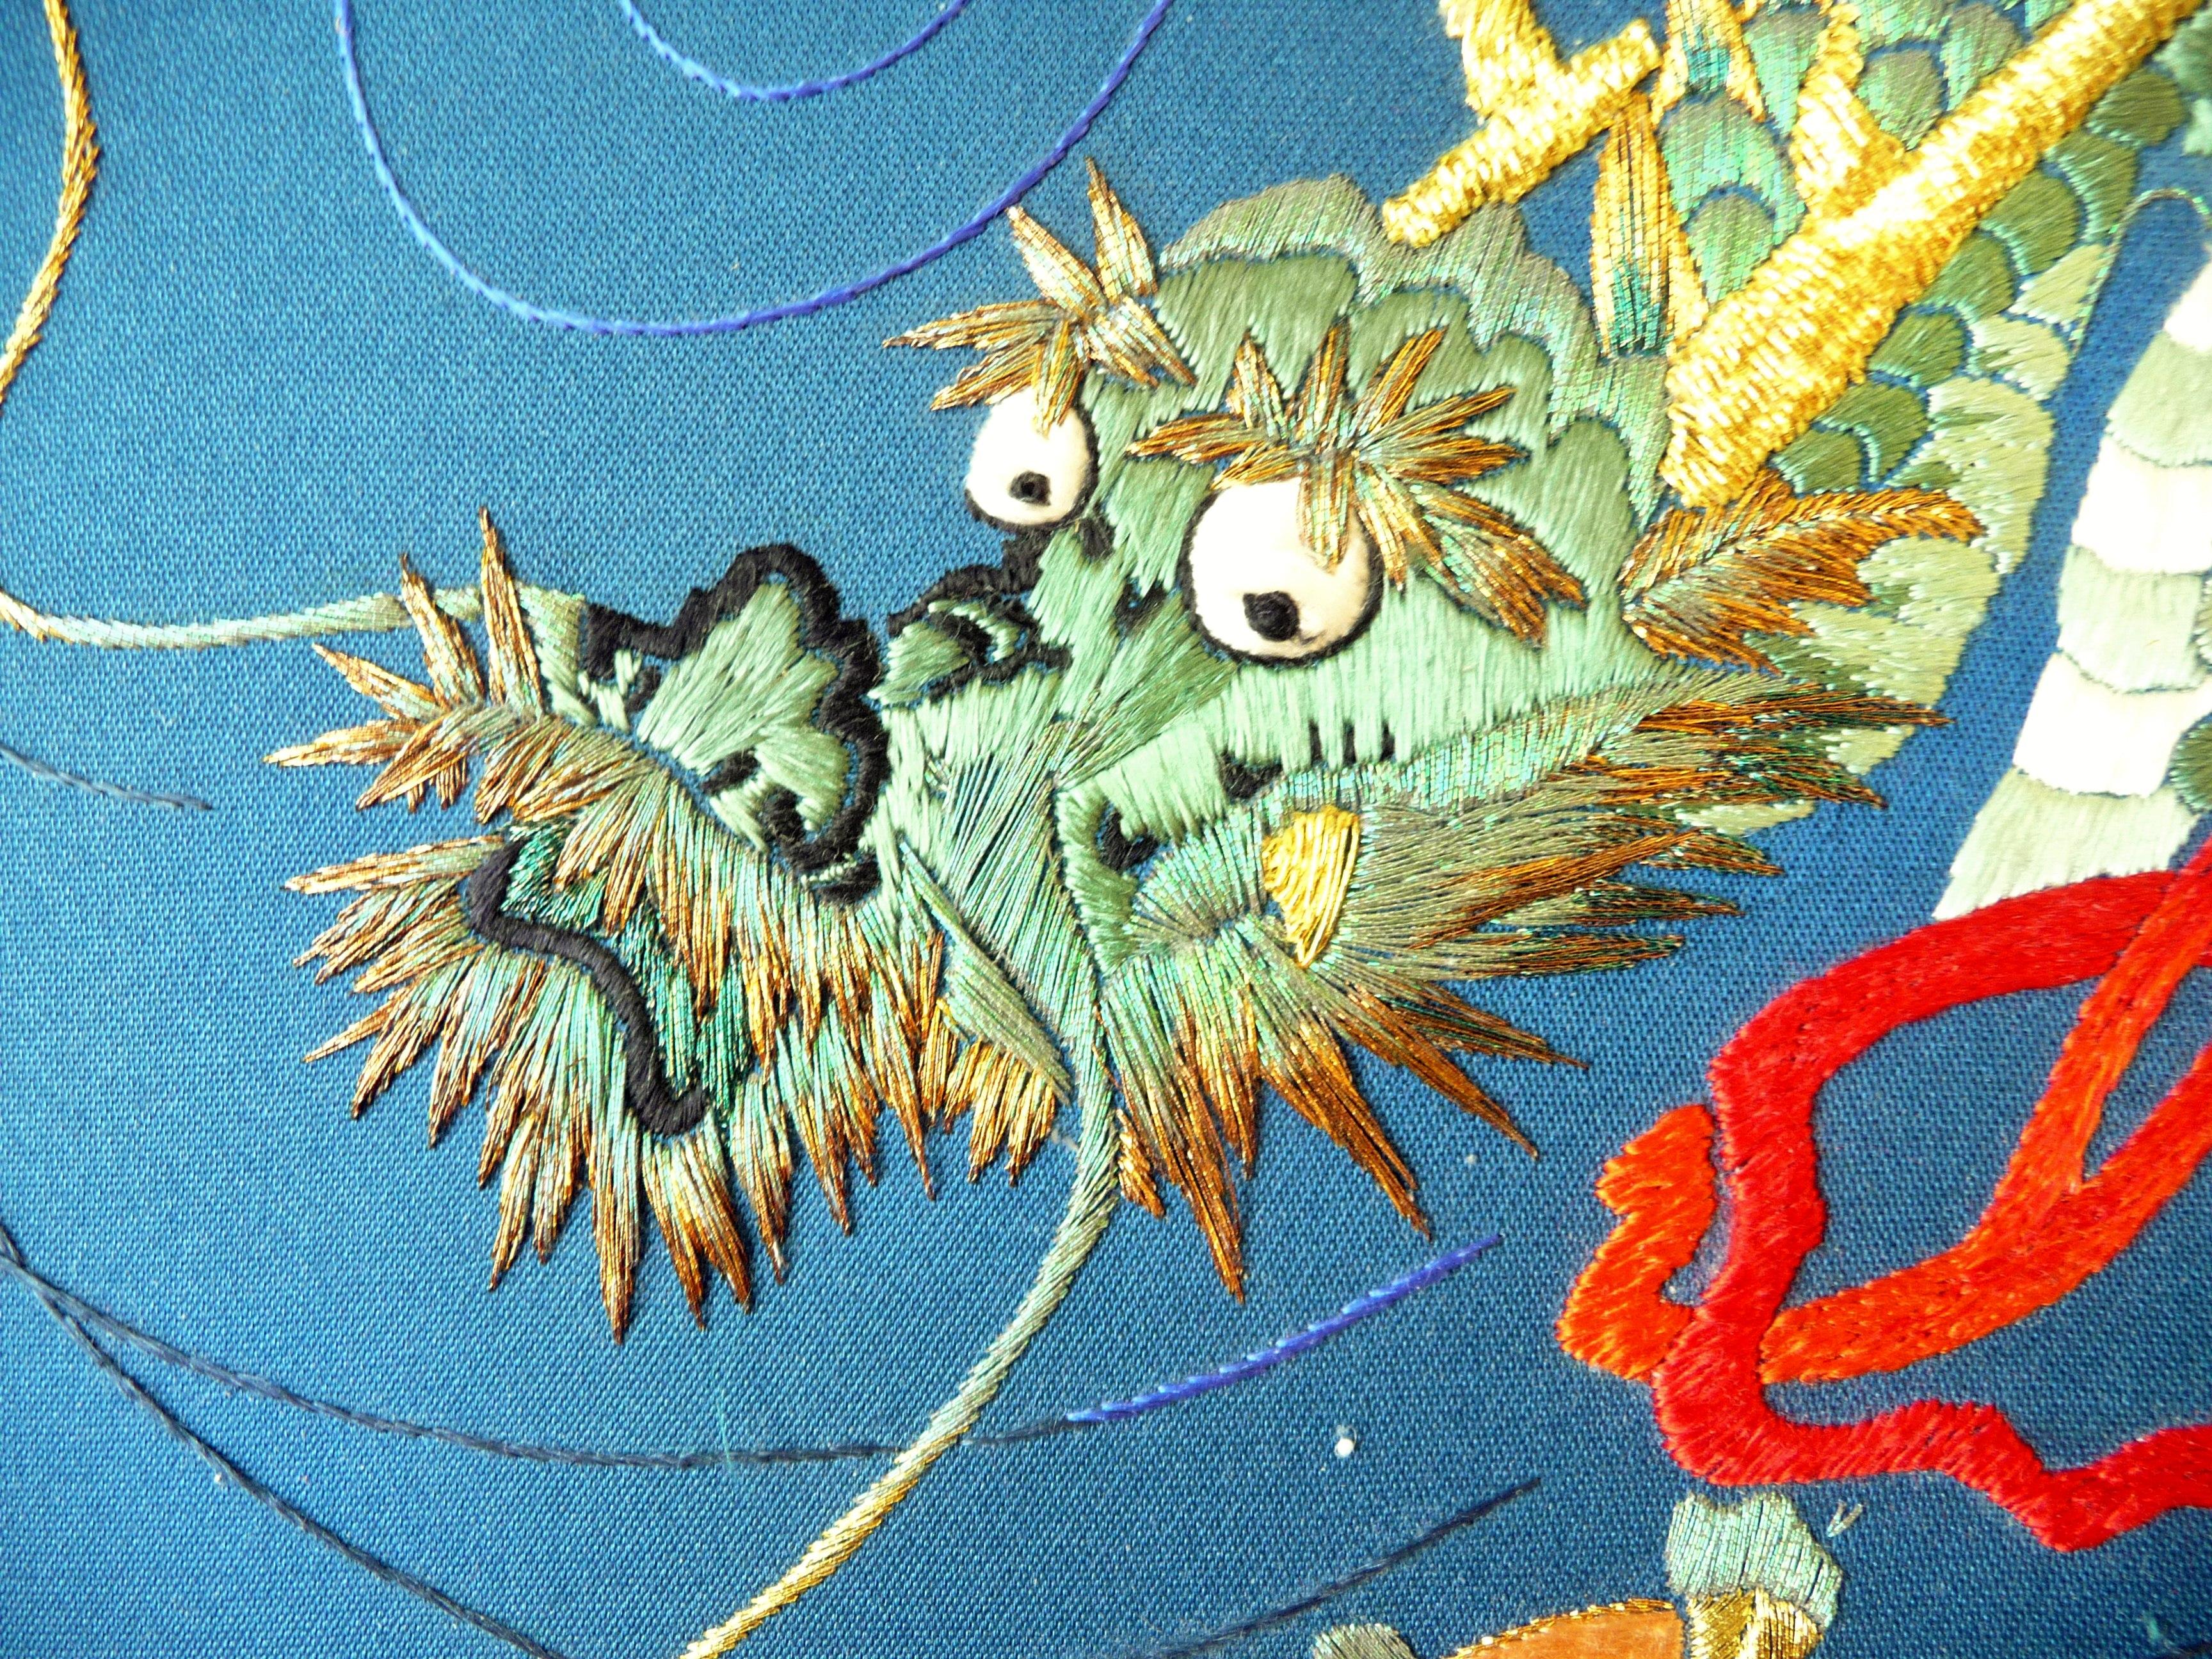 detail of Japanese embroidery by Sandra McFarlane, Altrincham EG